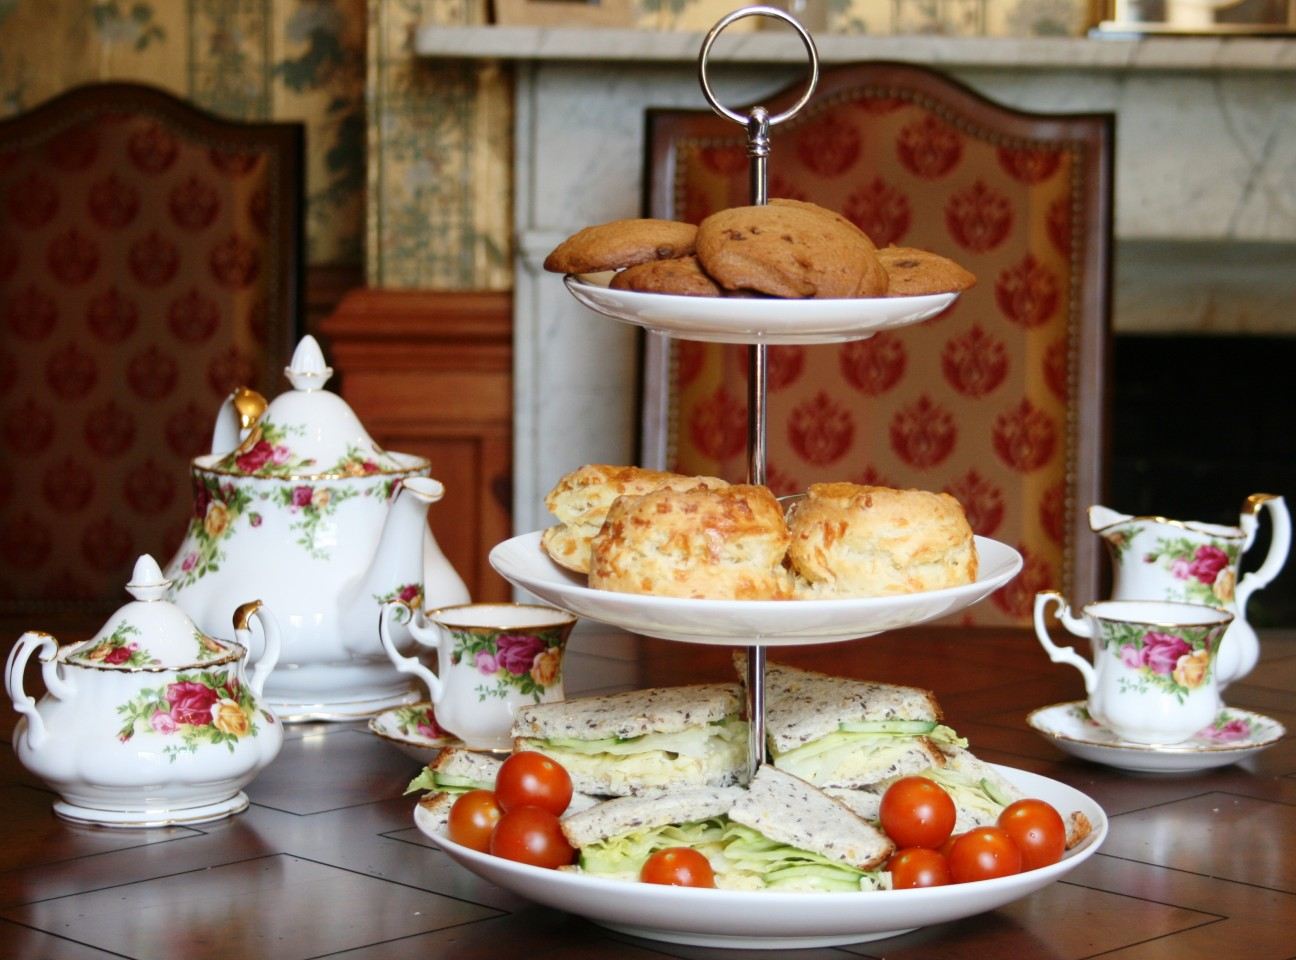 Afternoon Tea Kate Shrewsday